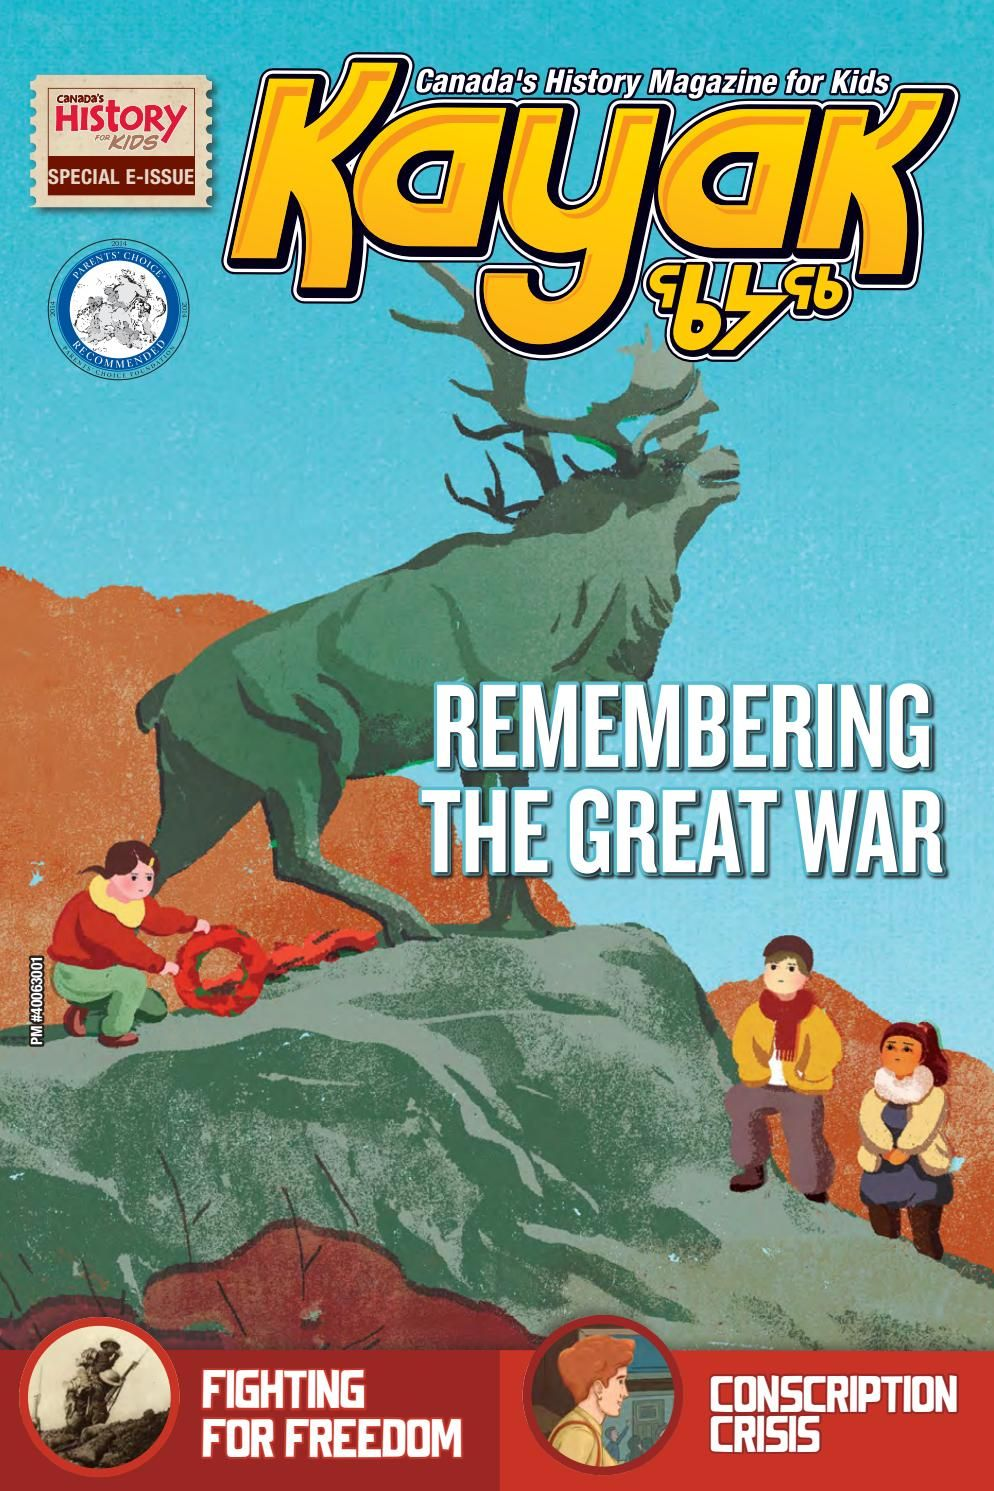 Kayak Remembering the Great War Magazines for kids